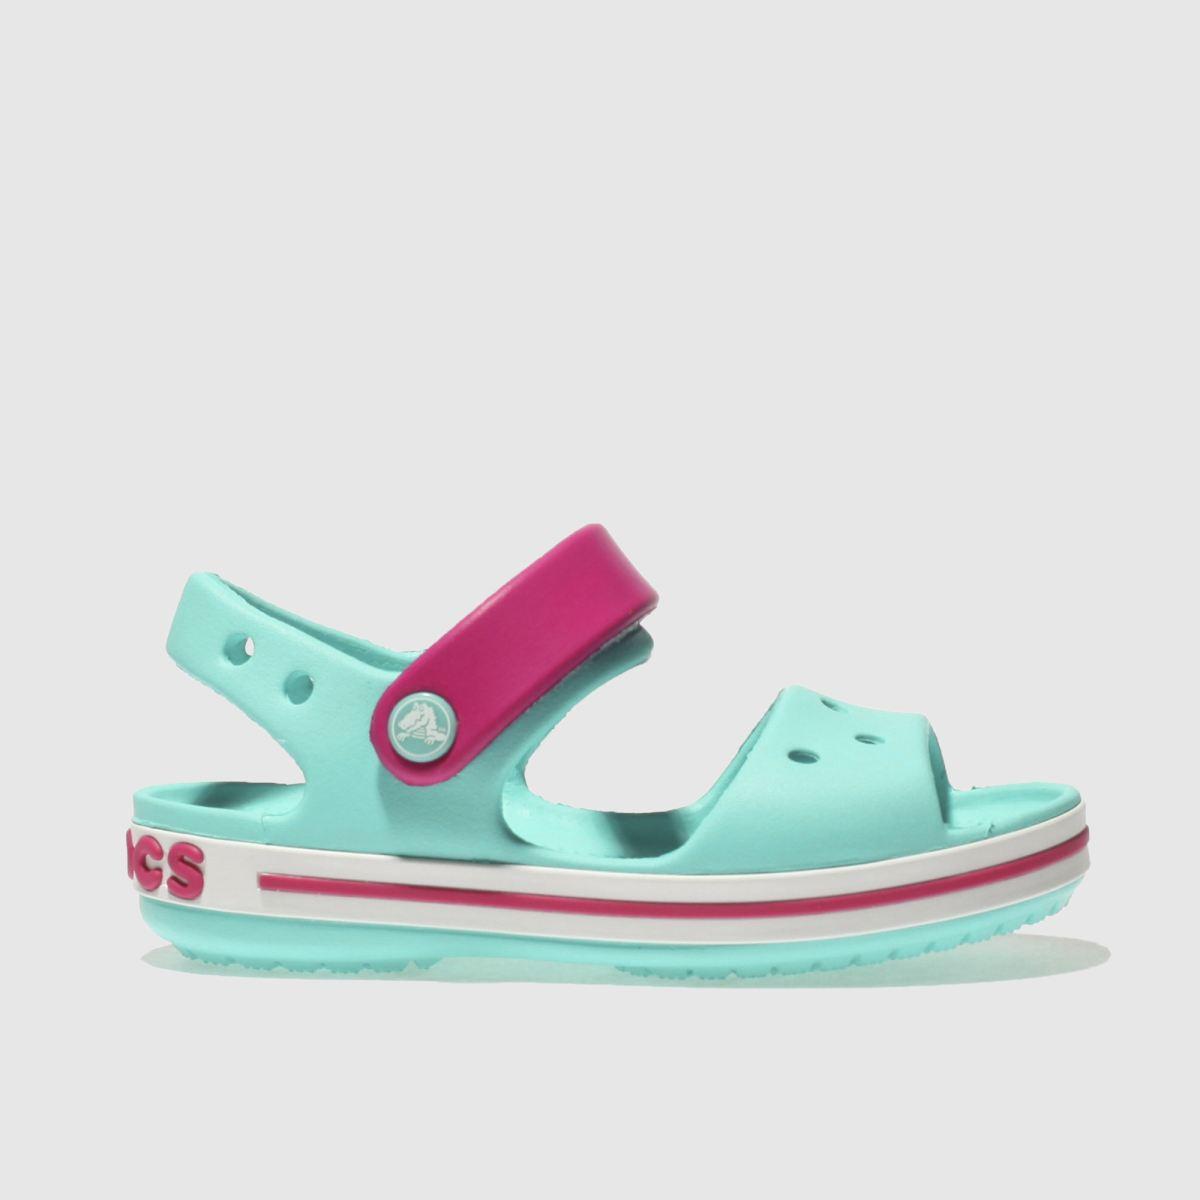 Crocs Crocs Pale Blue Crocband Sandal Girls Junior Sandals